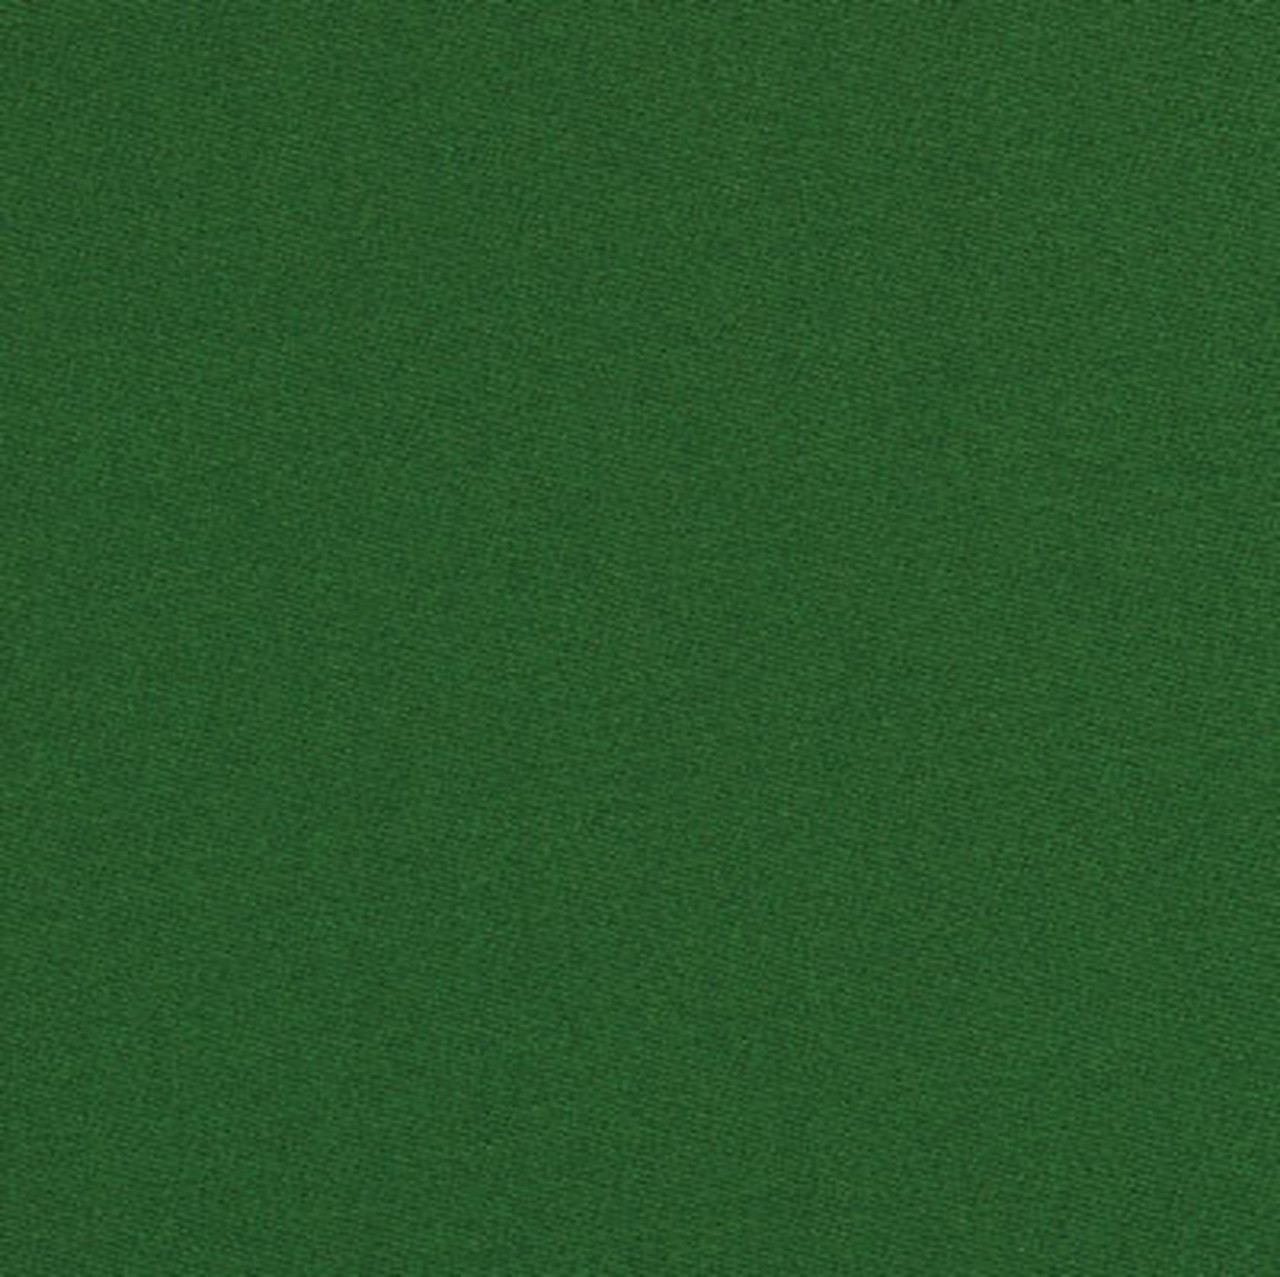 Simonis 860 English Green Pool Table Felt - 7ft